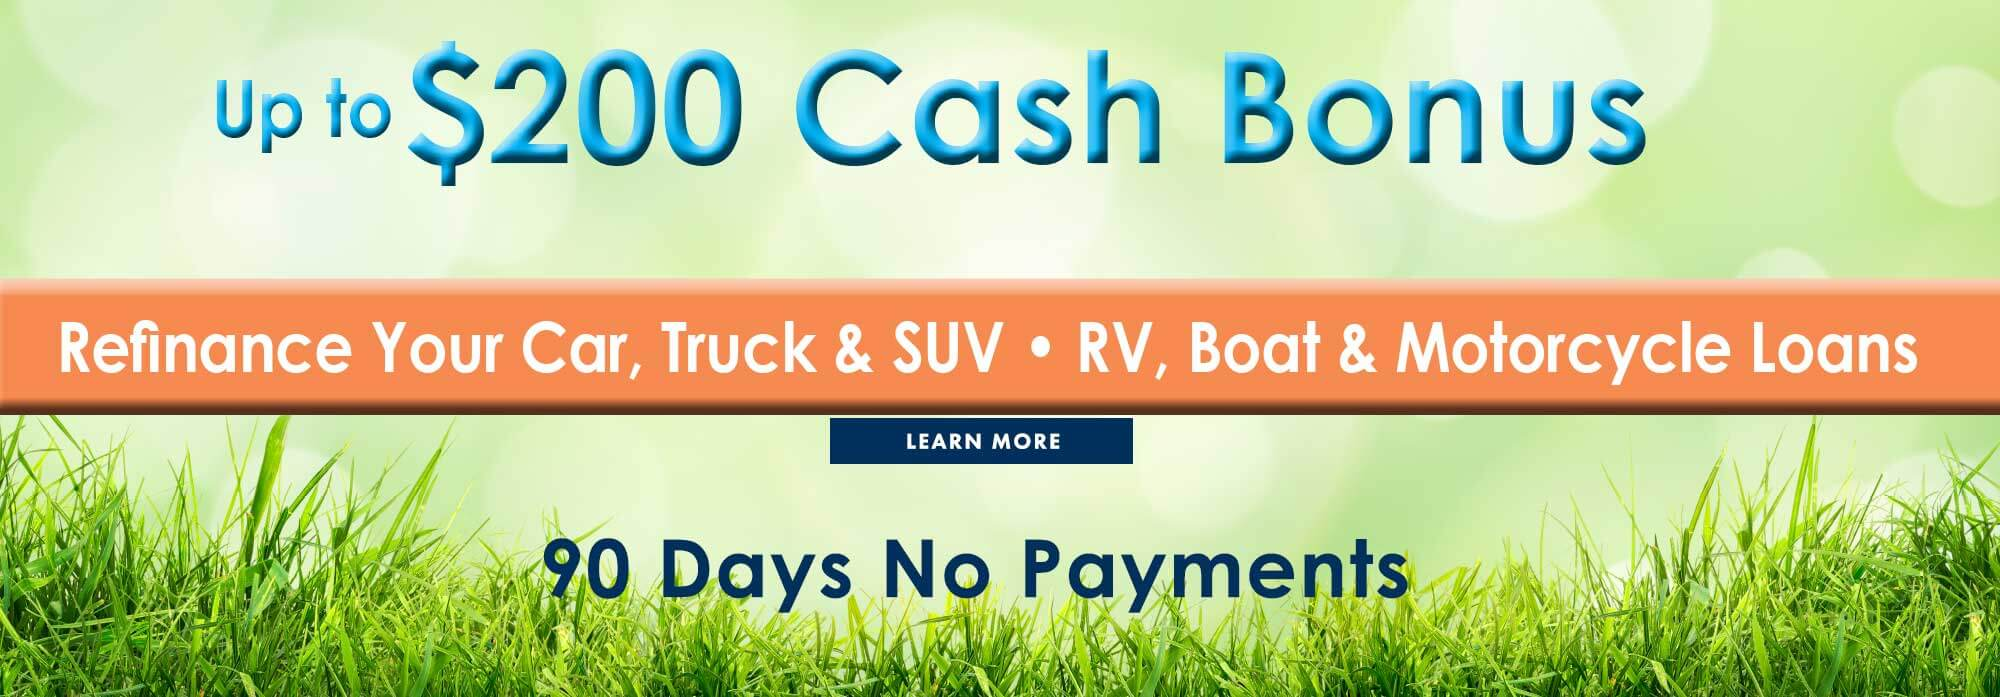 $200 Cash Bonus - Spring Refinance Sale